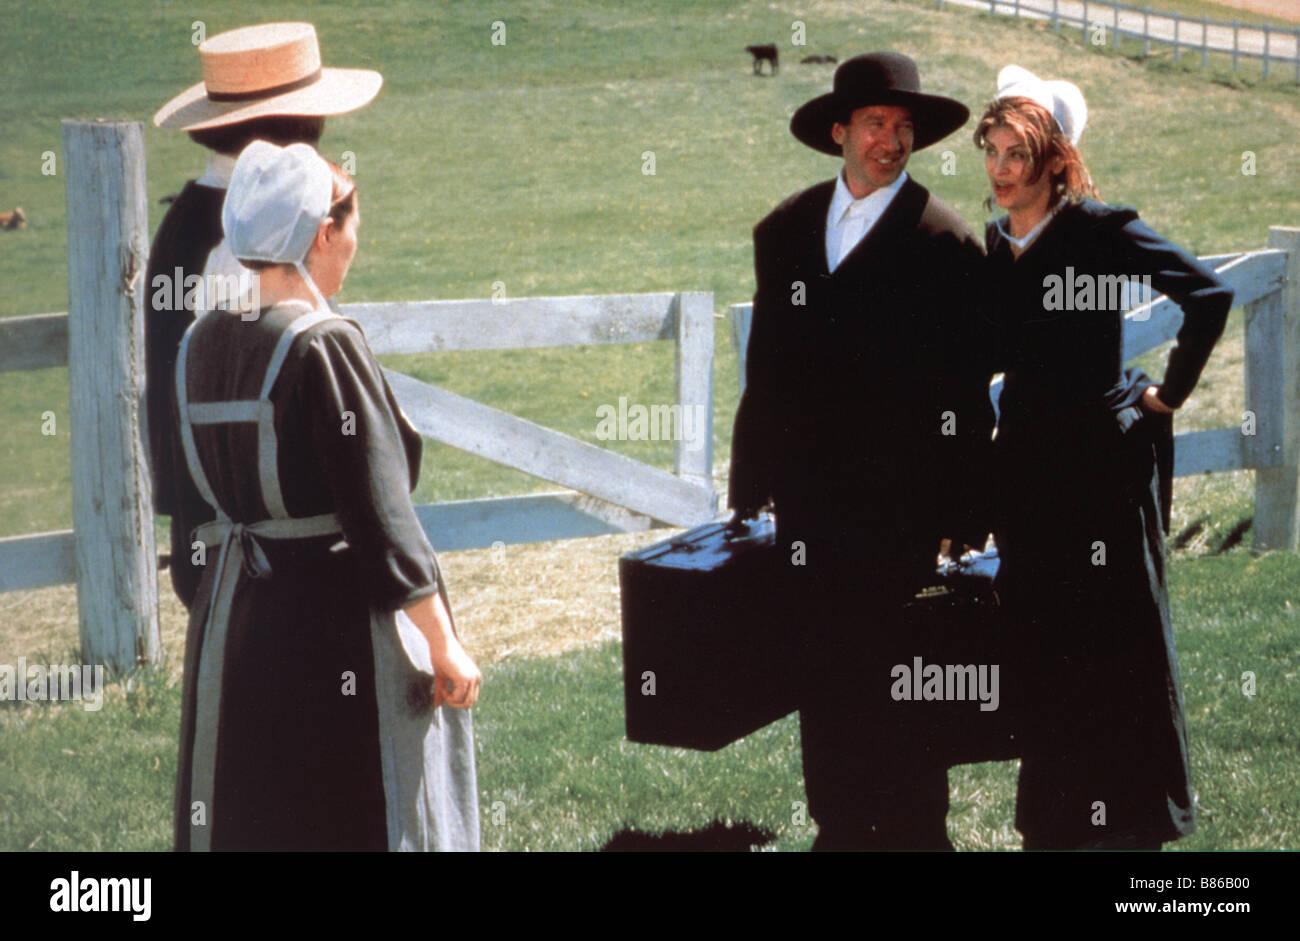 For Richer or Poorer  Année : 1997 - USA Tim Allen, Kirstie Alley  Director : Bryan Spicer - Stock Image